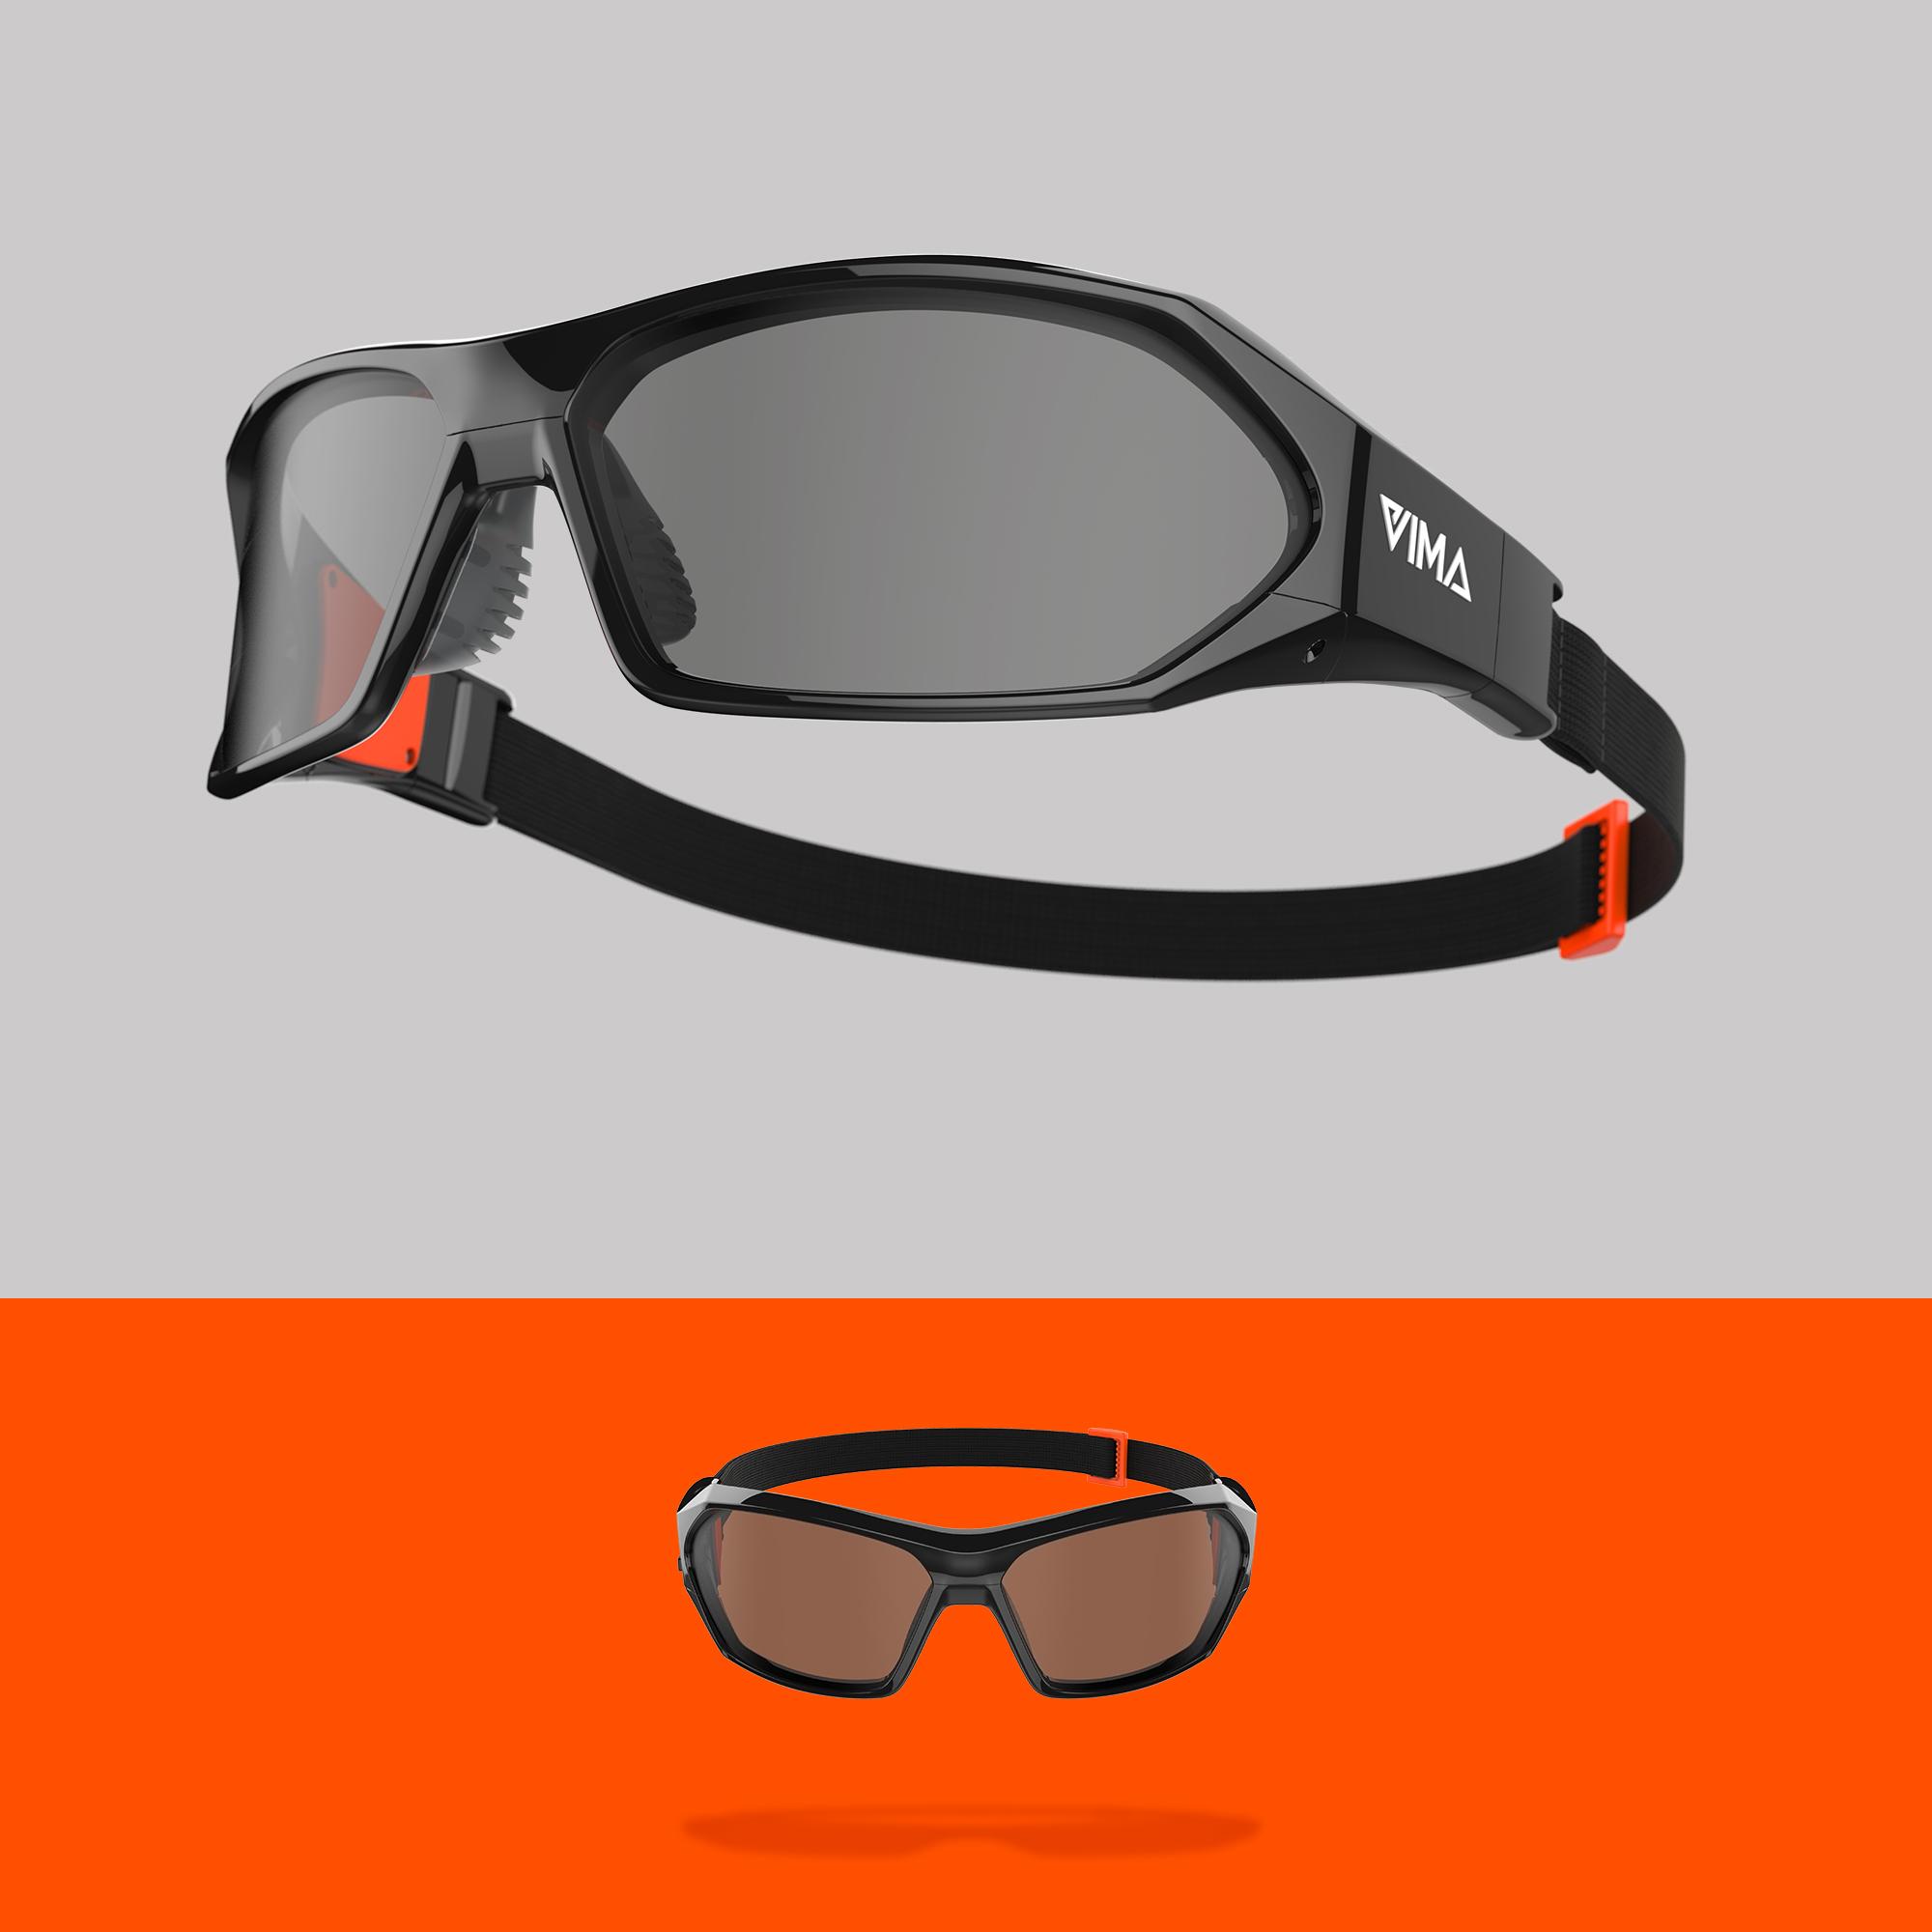 vima-rev-product-rendering-sport-01.jpg